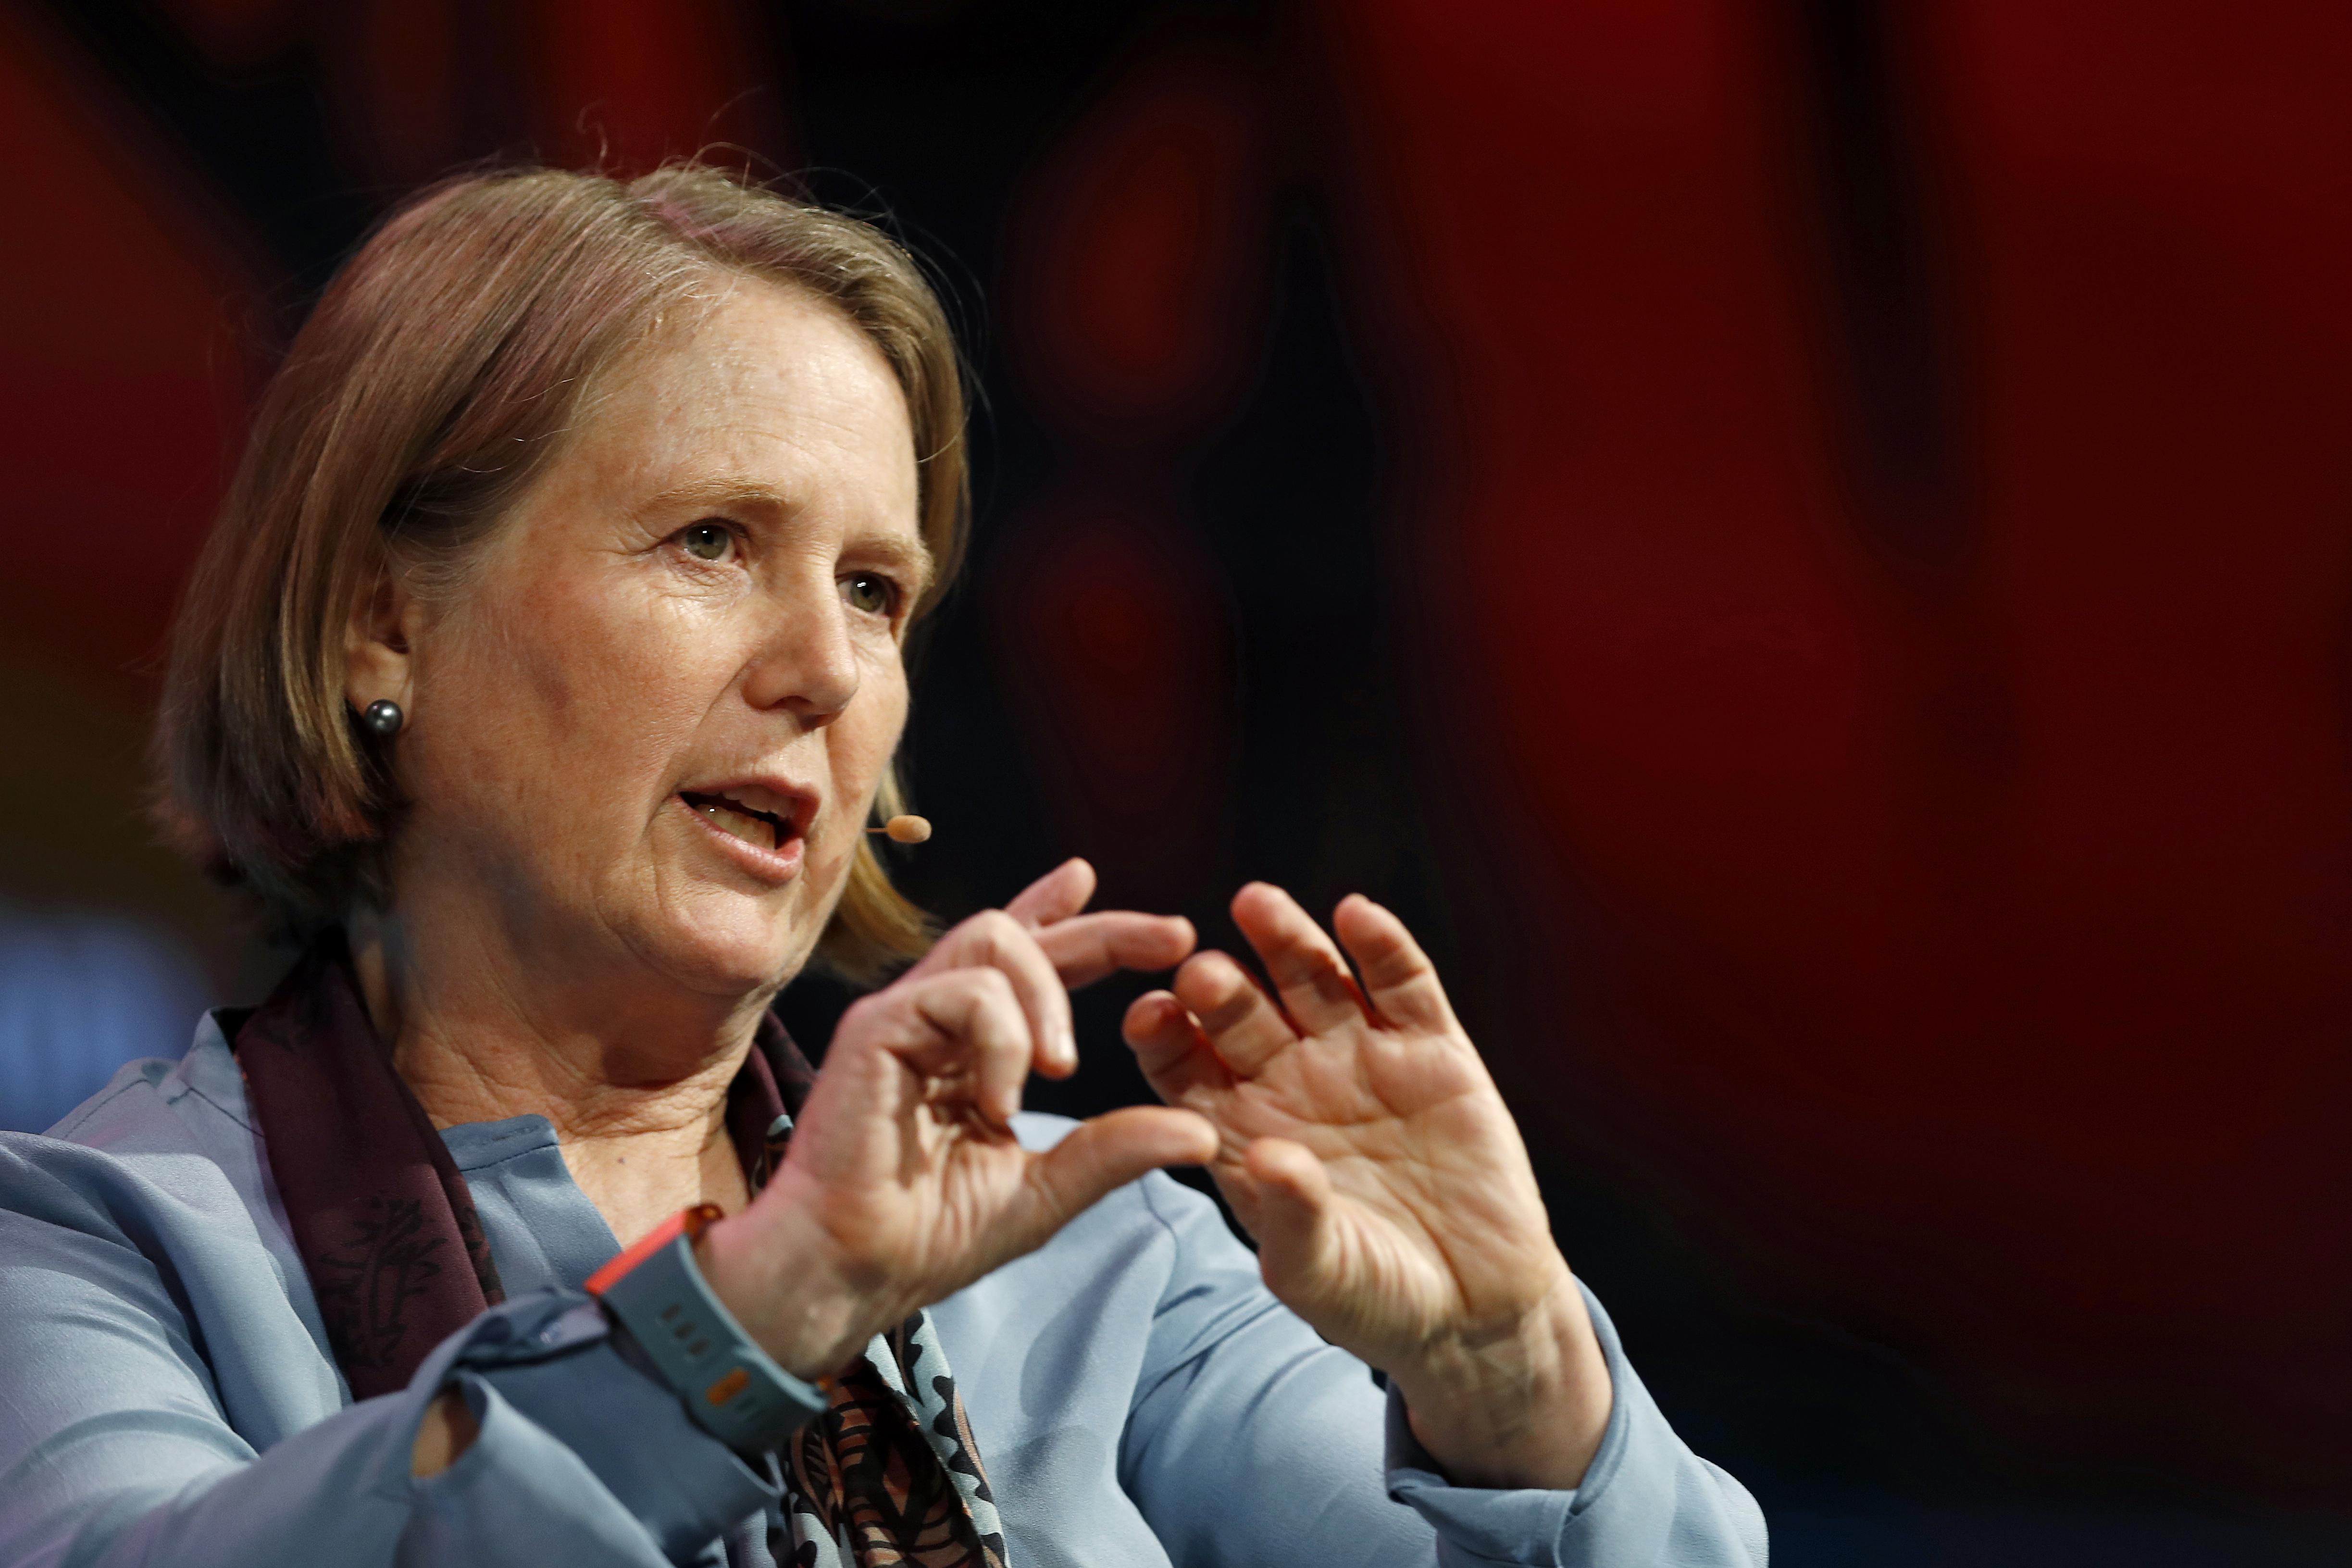 Diane Green, cloud chief at Google, gestures onstage